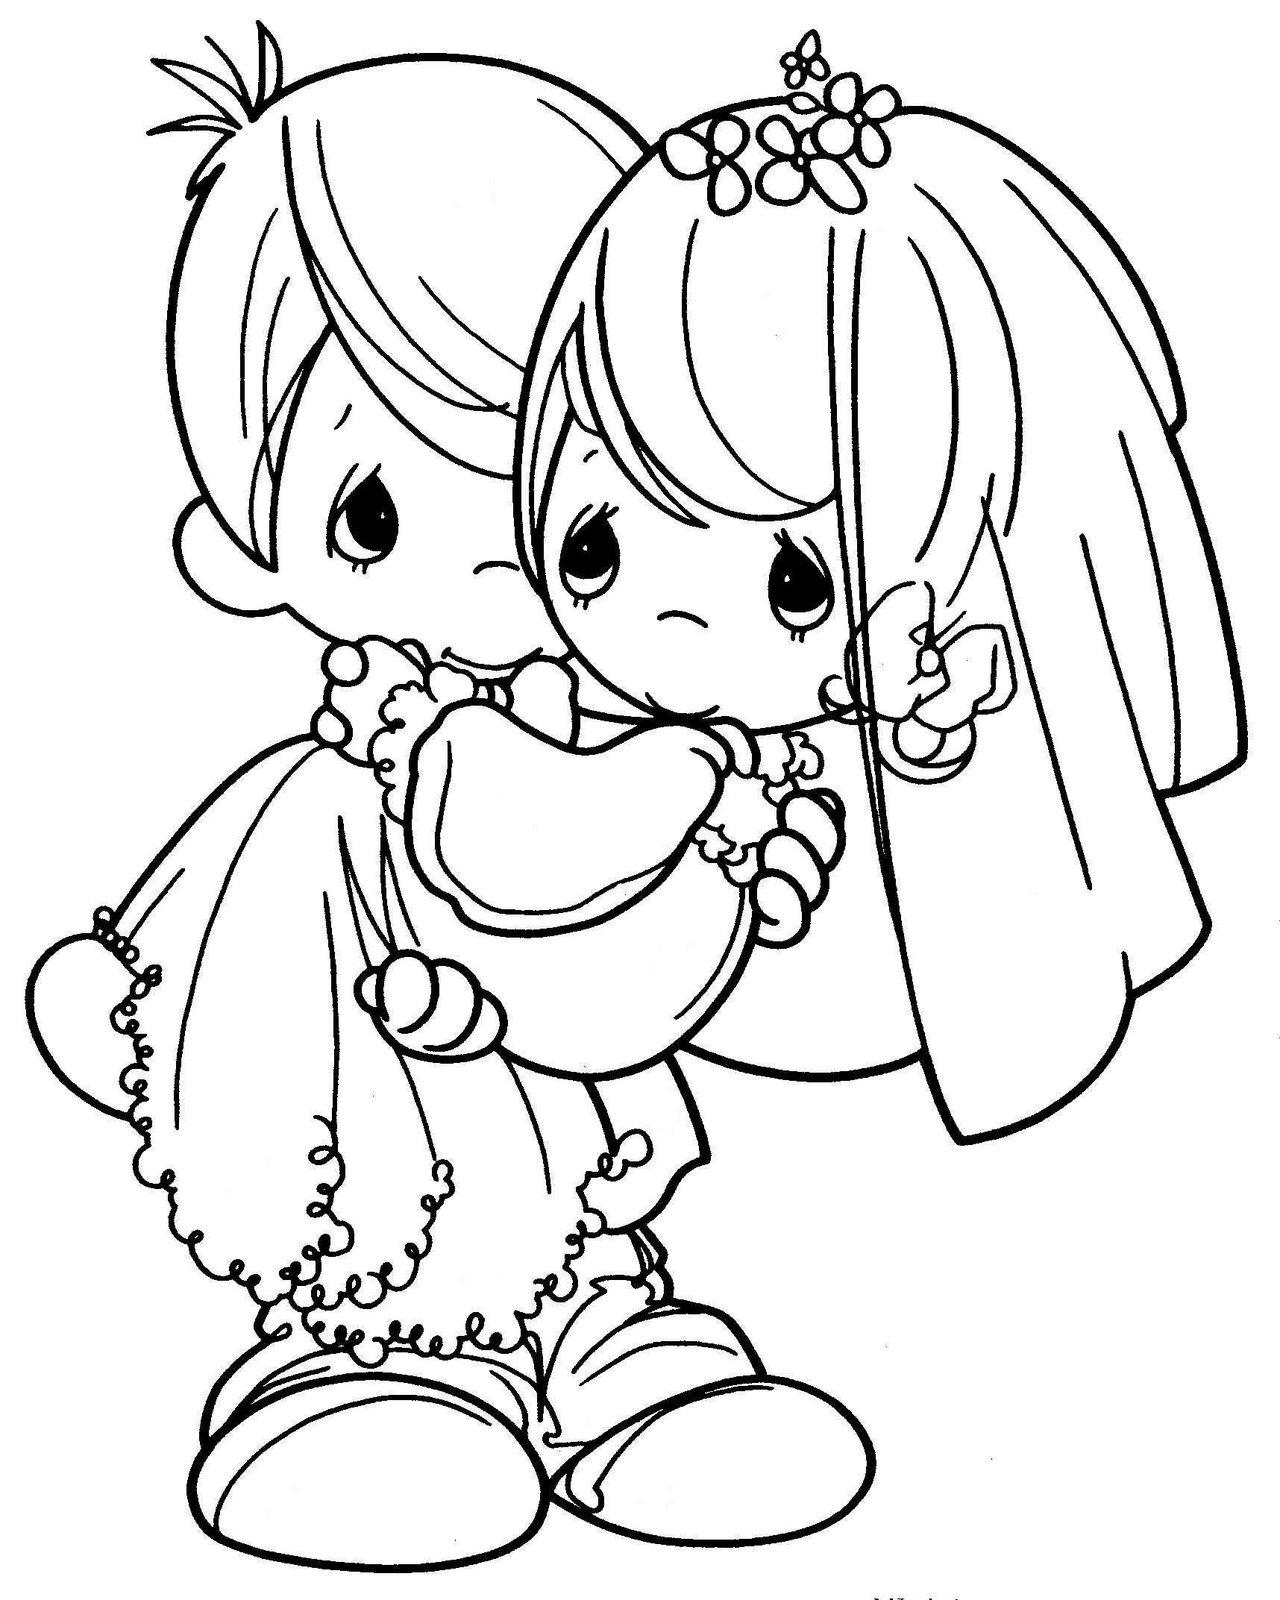 Imagenes de novios en caricatura - Imagui